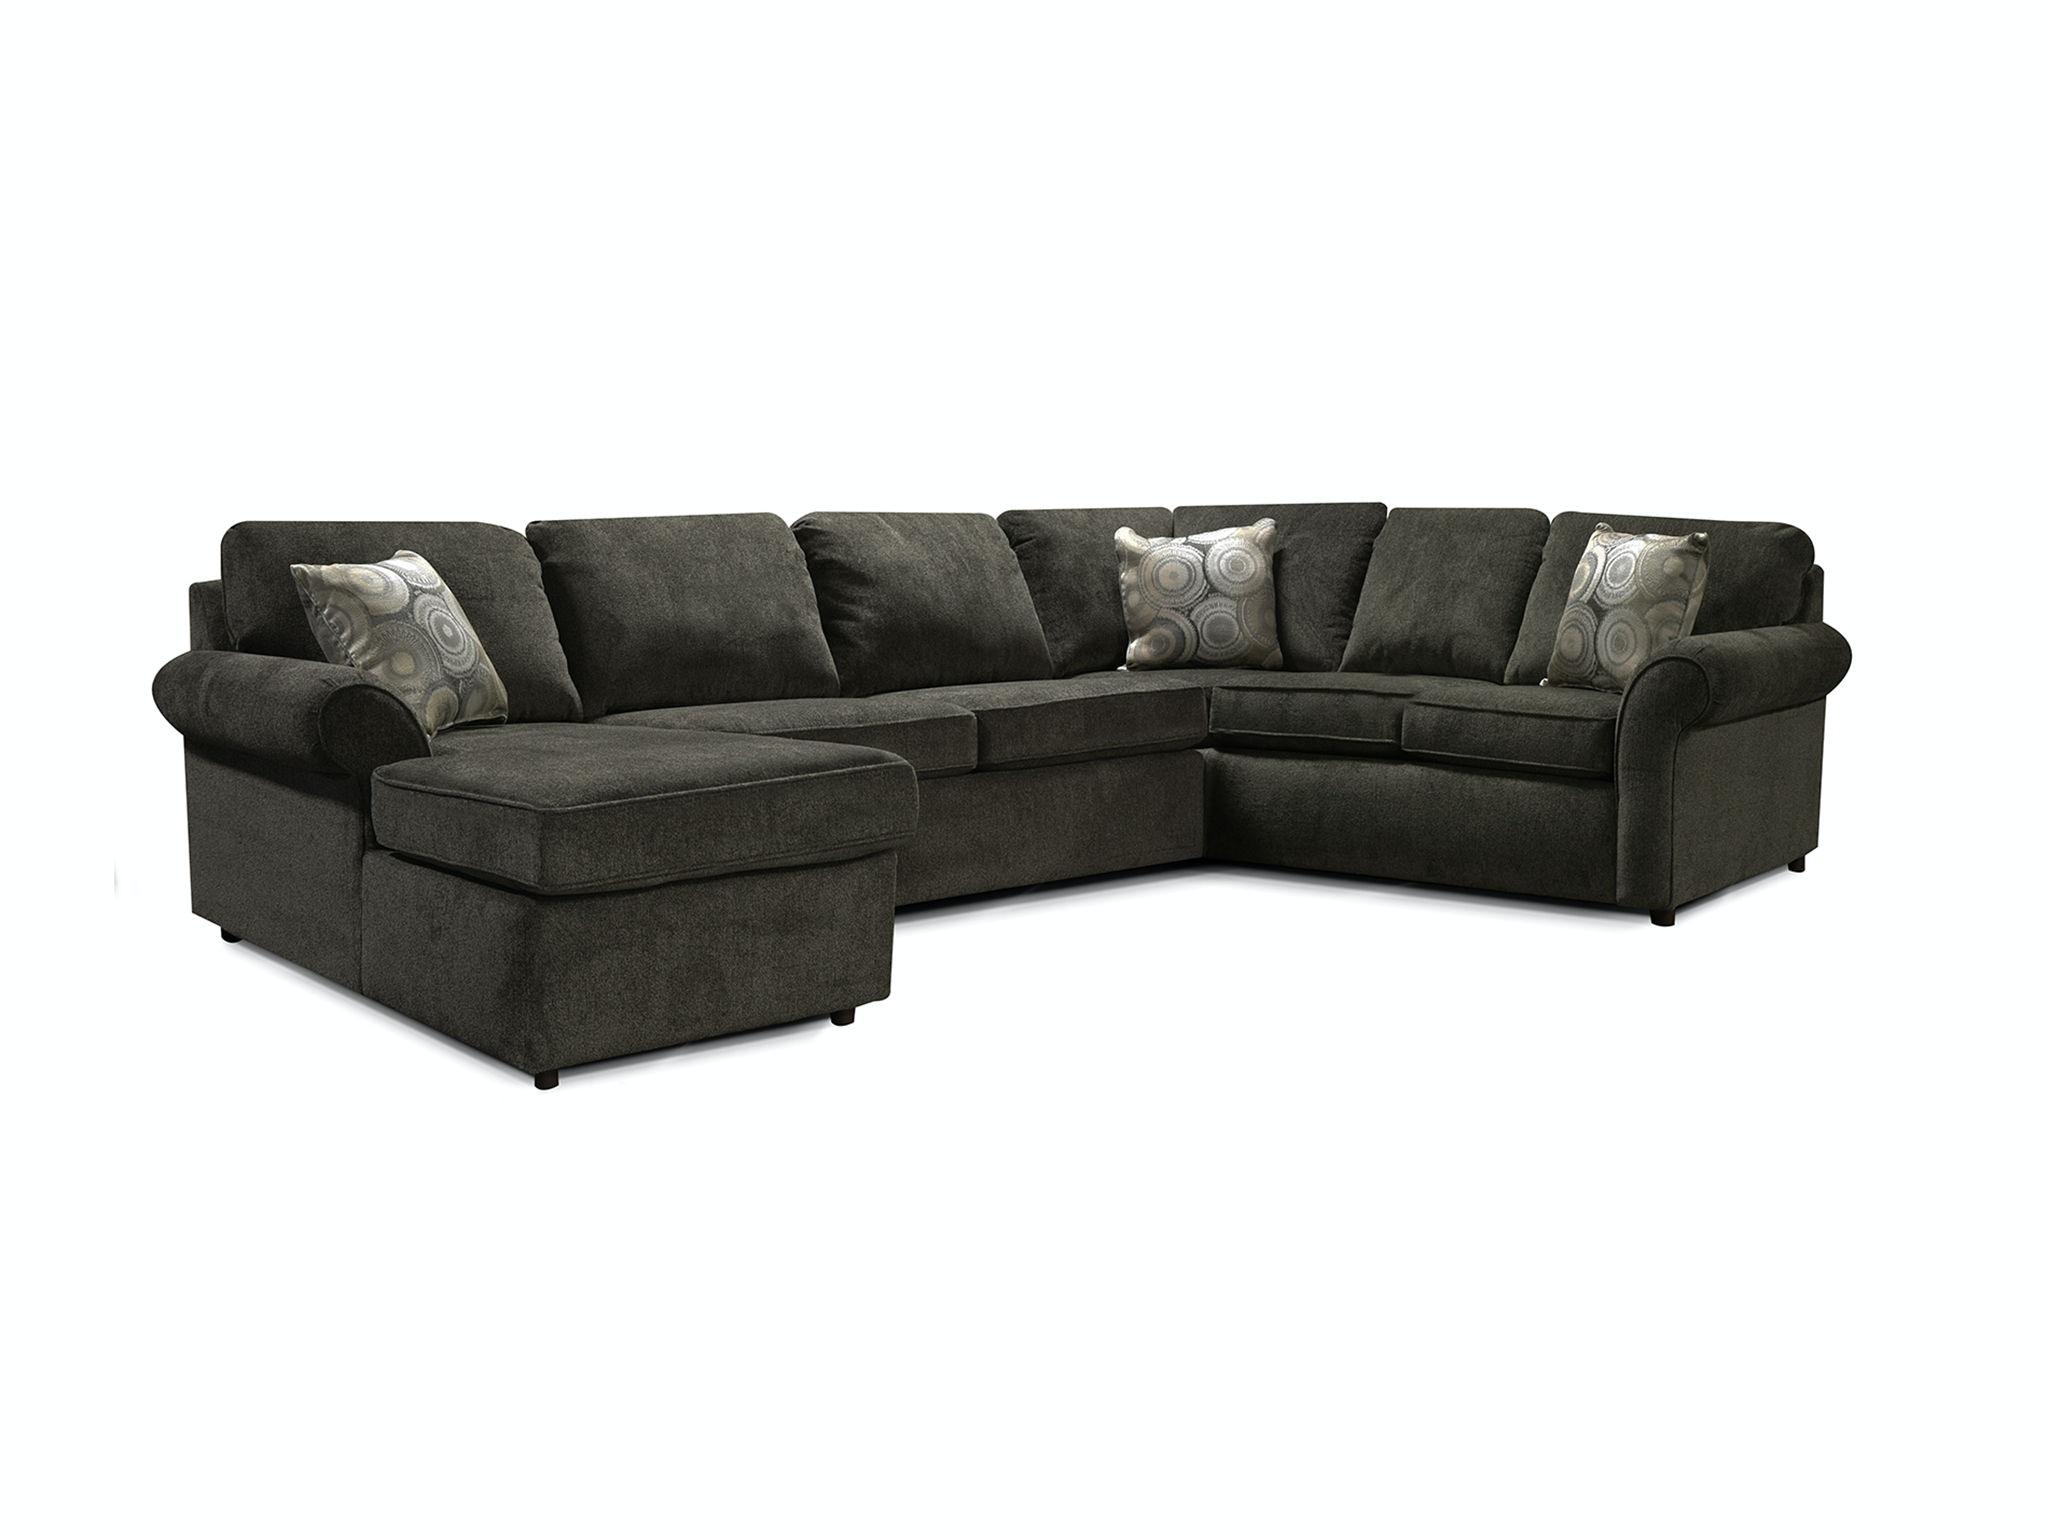 2400-Sect. Malibu Sectional  sc 1 st  England Furniture : england furniture sectional - Sectionals, Sofas & Couches